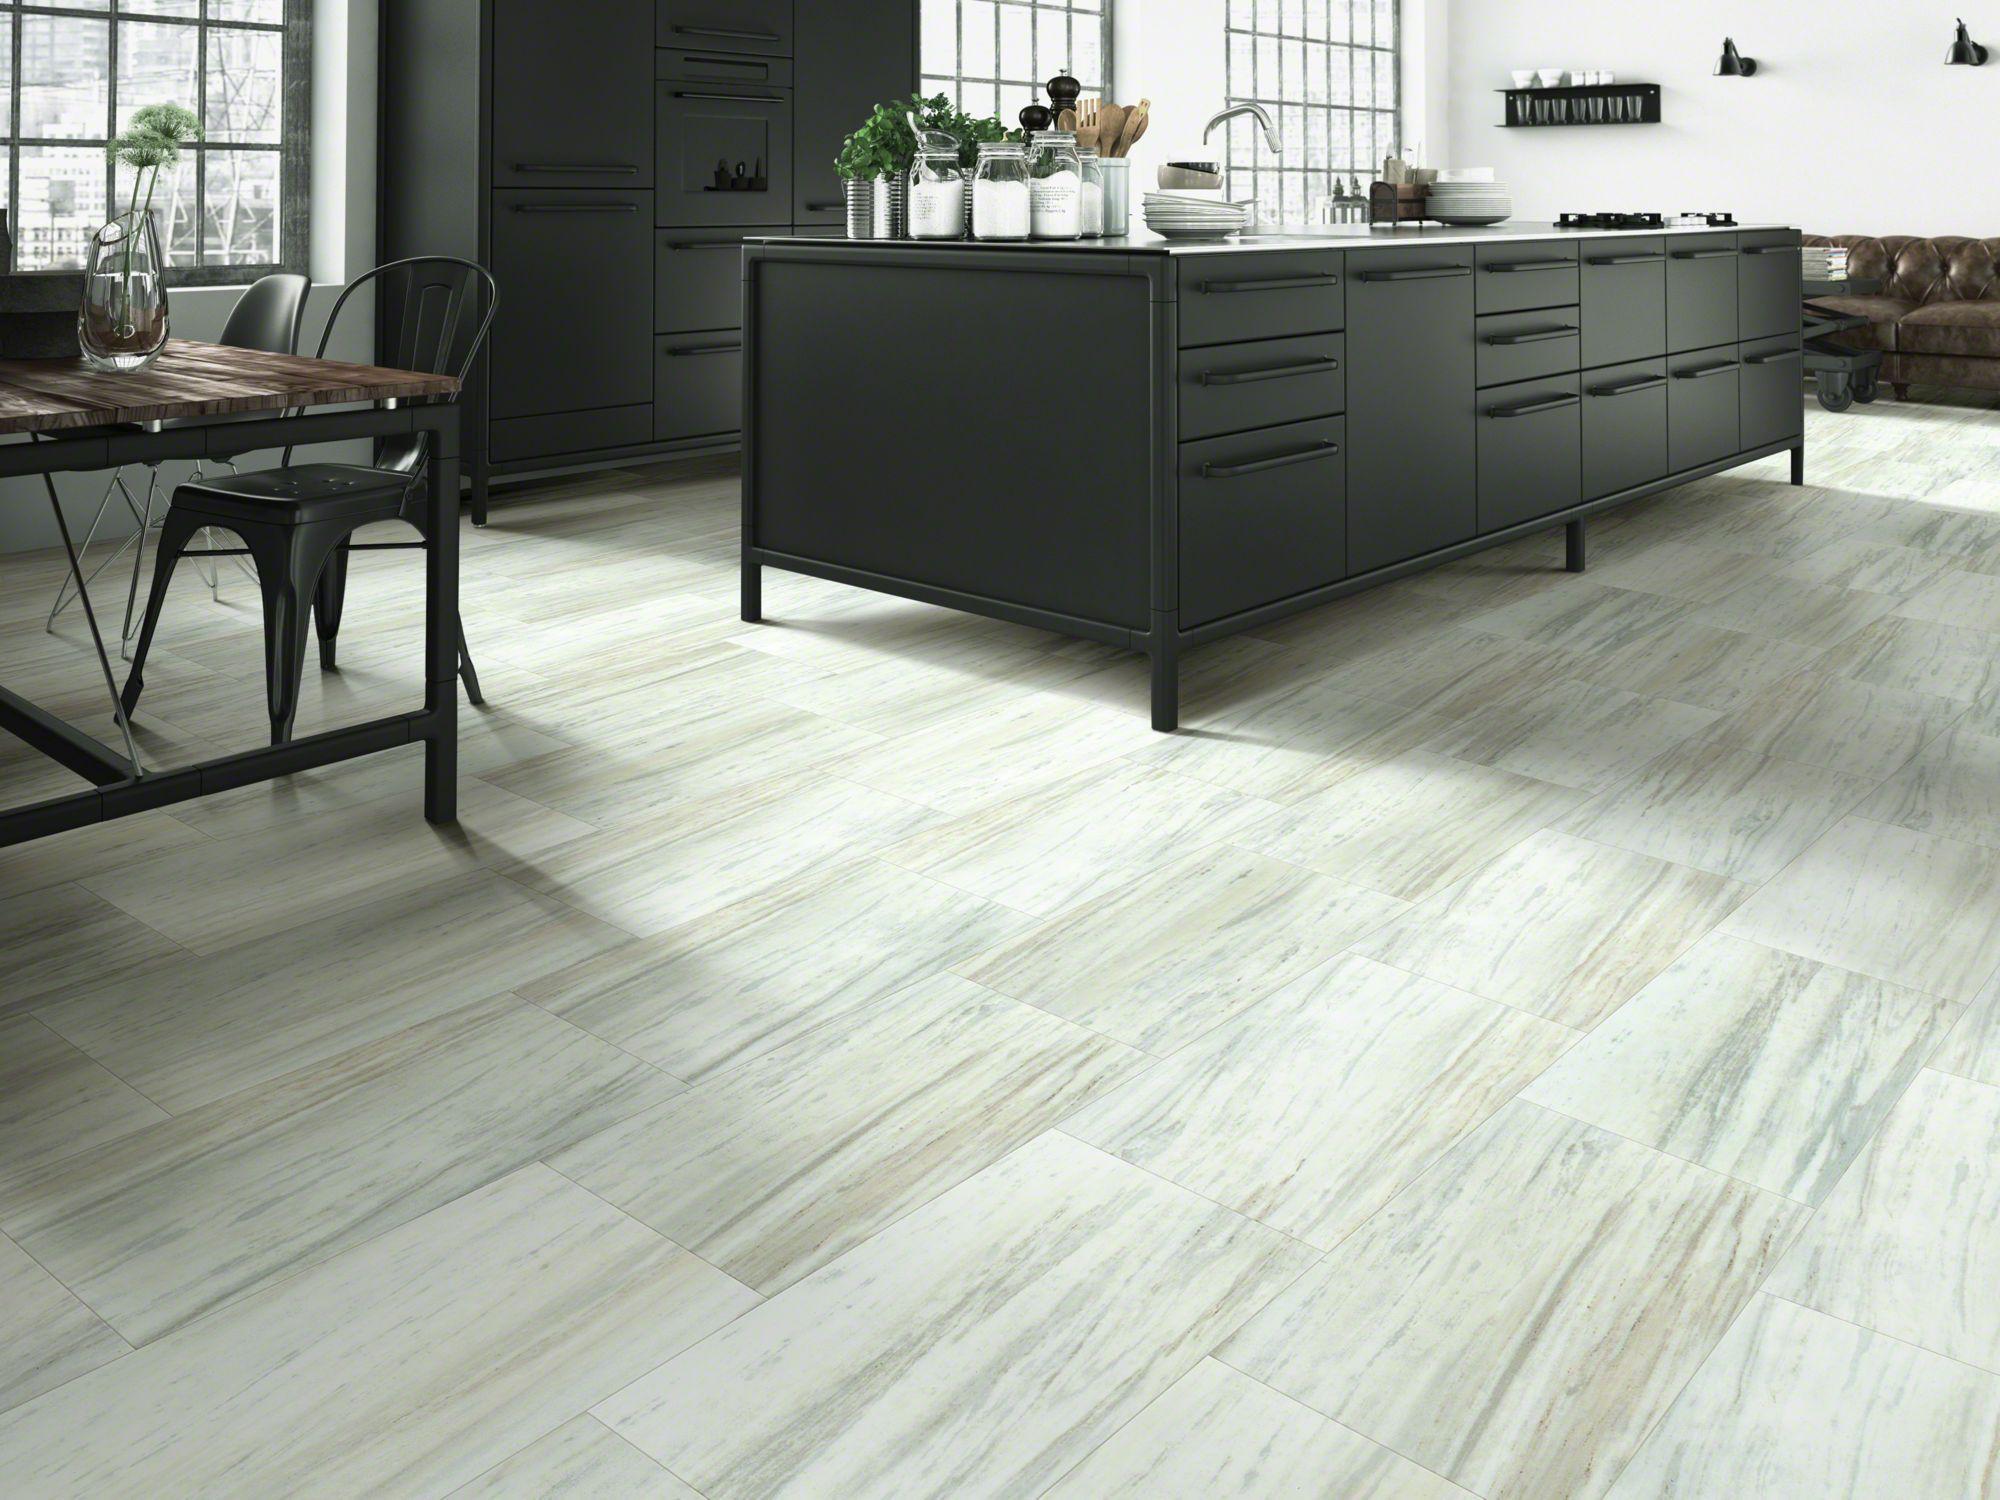 Stone Works 720c Plus Room View Flooring, Wood plank